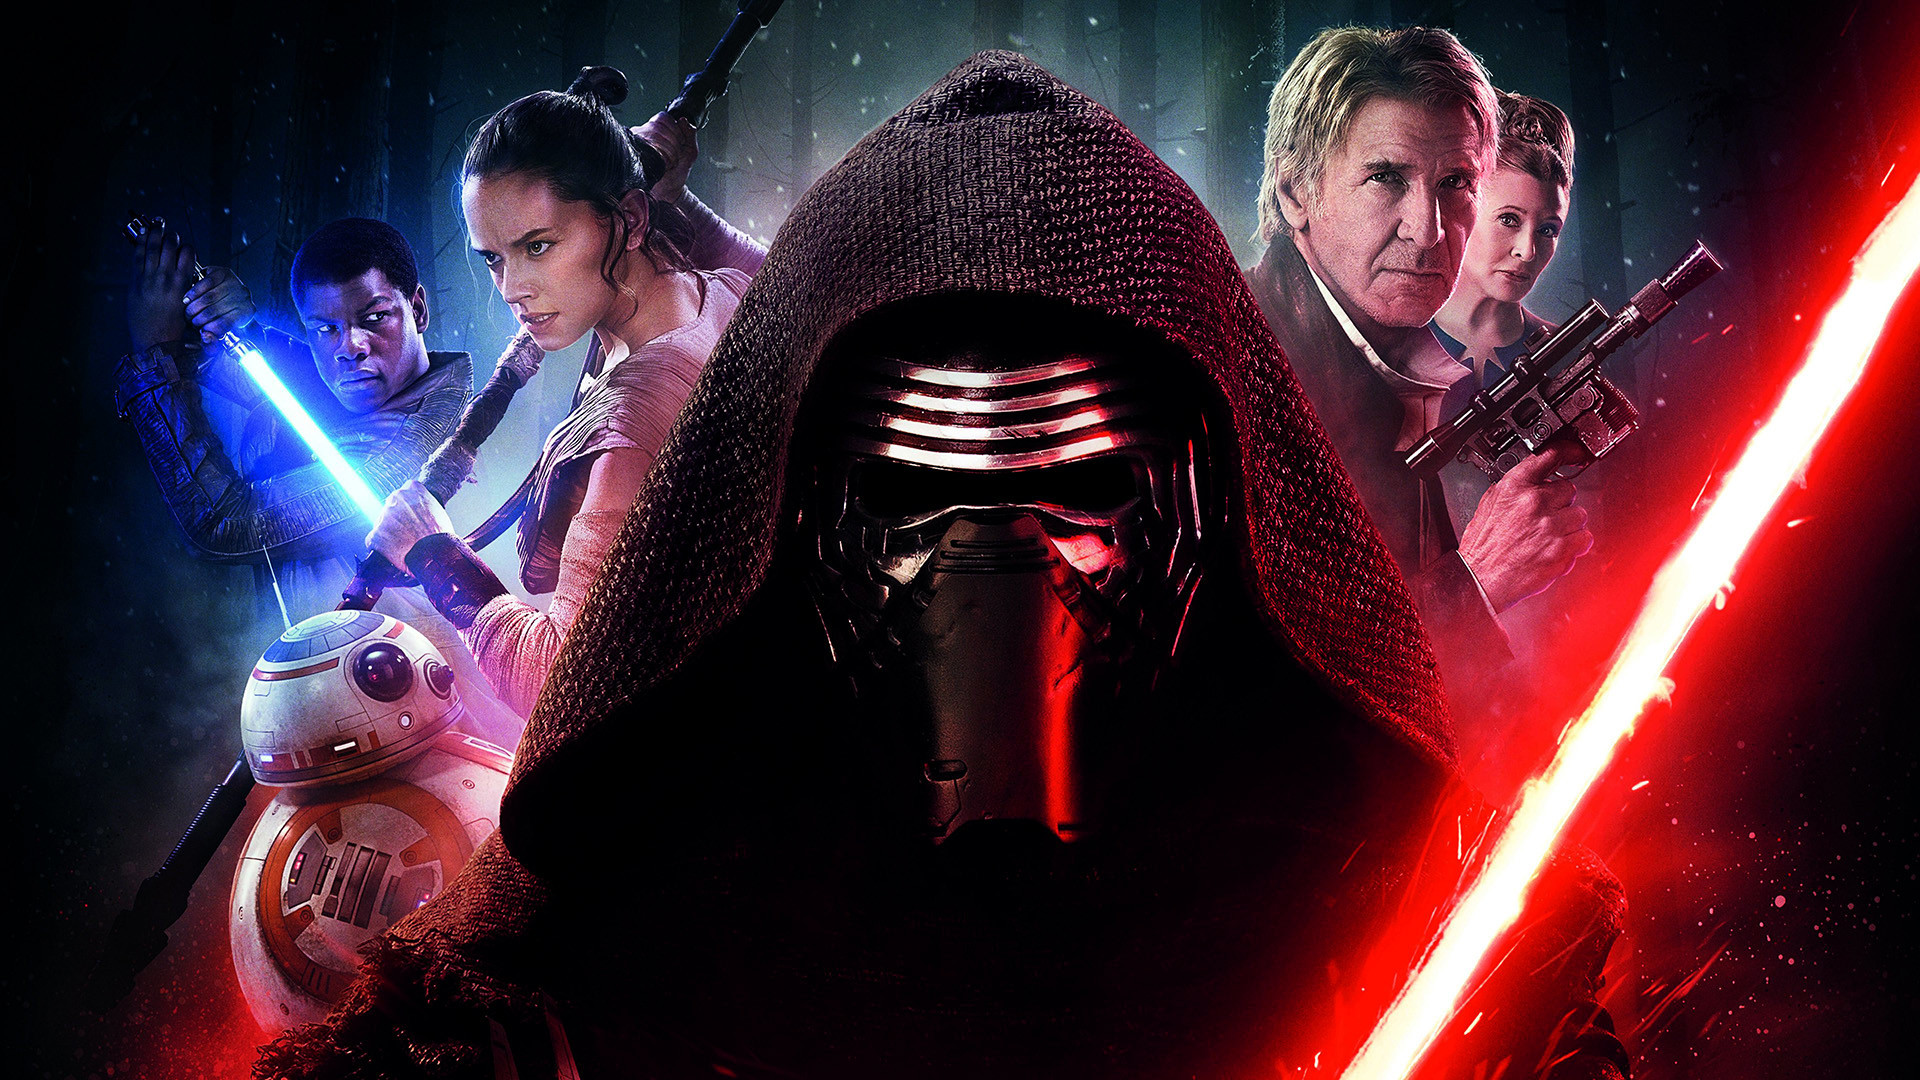 Star Wars Episode 2 WallpaperWallpapers Star Wars Movies Star Wars Episode  Ii Movies